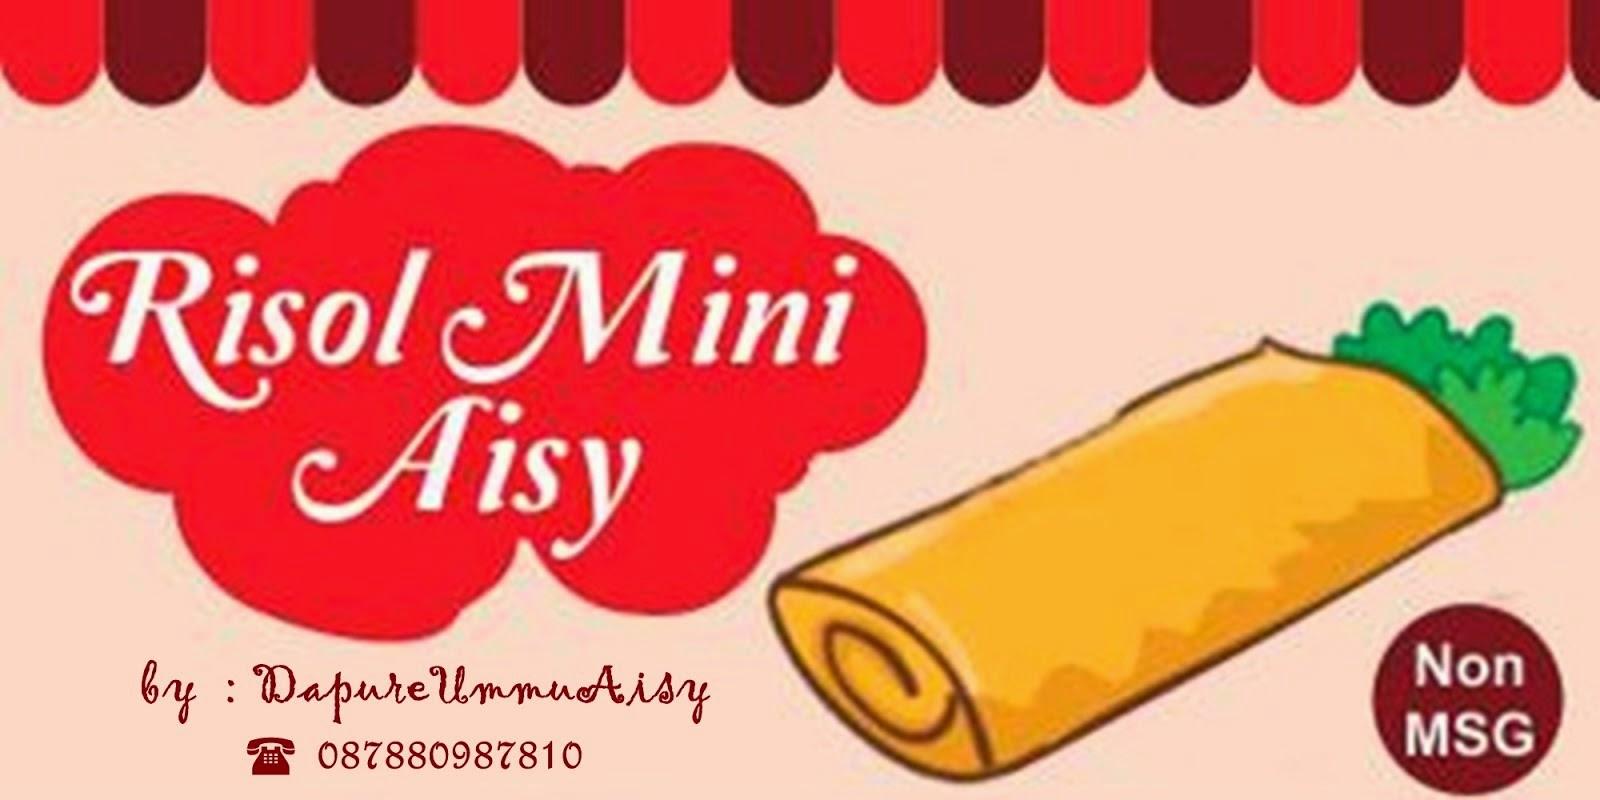 Risol Mini Aisy